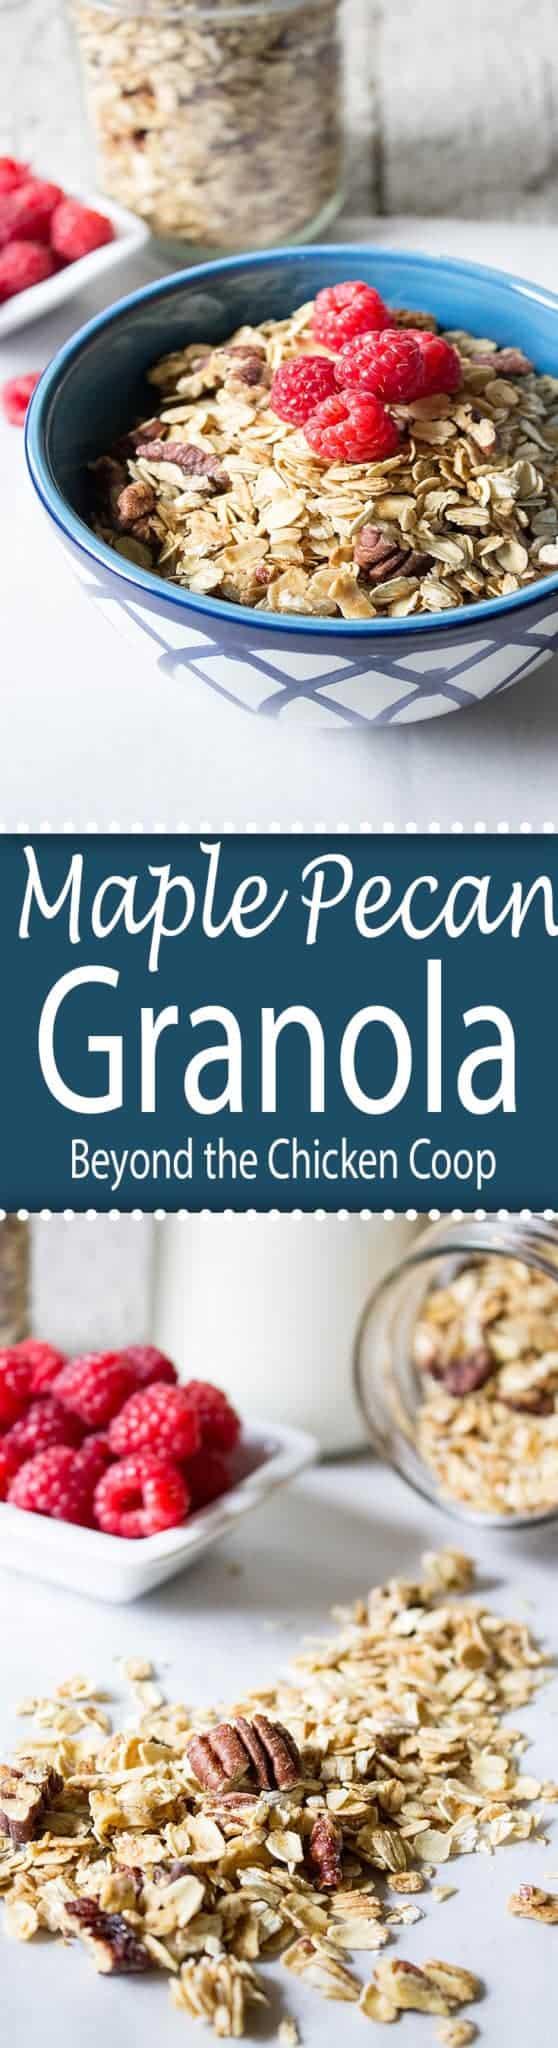 Maple Pecan Granola - Beyond The Chicken Coop